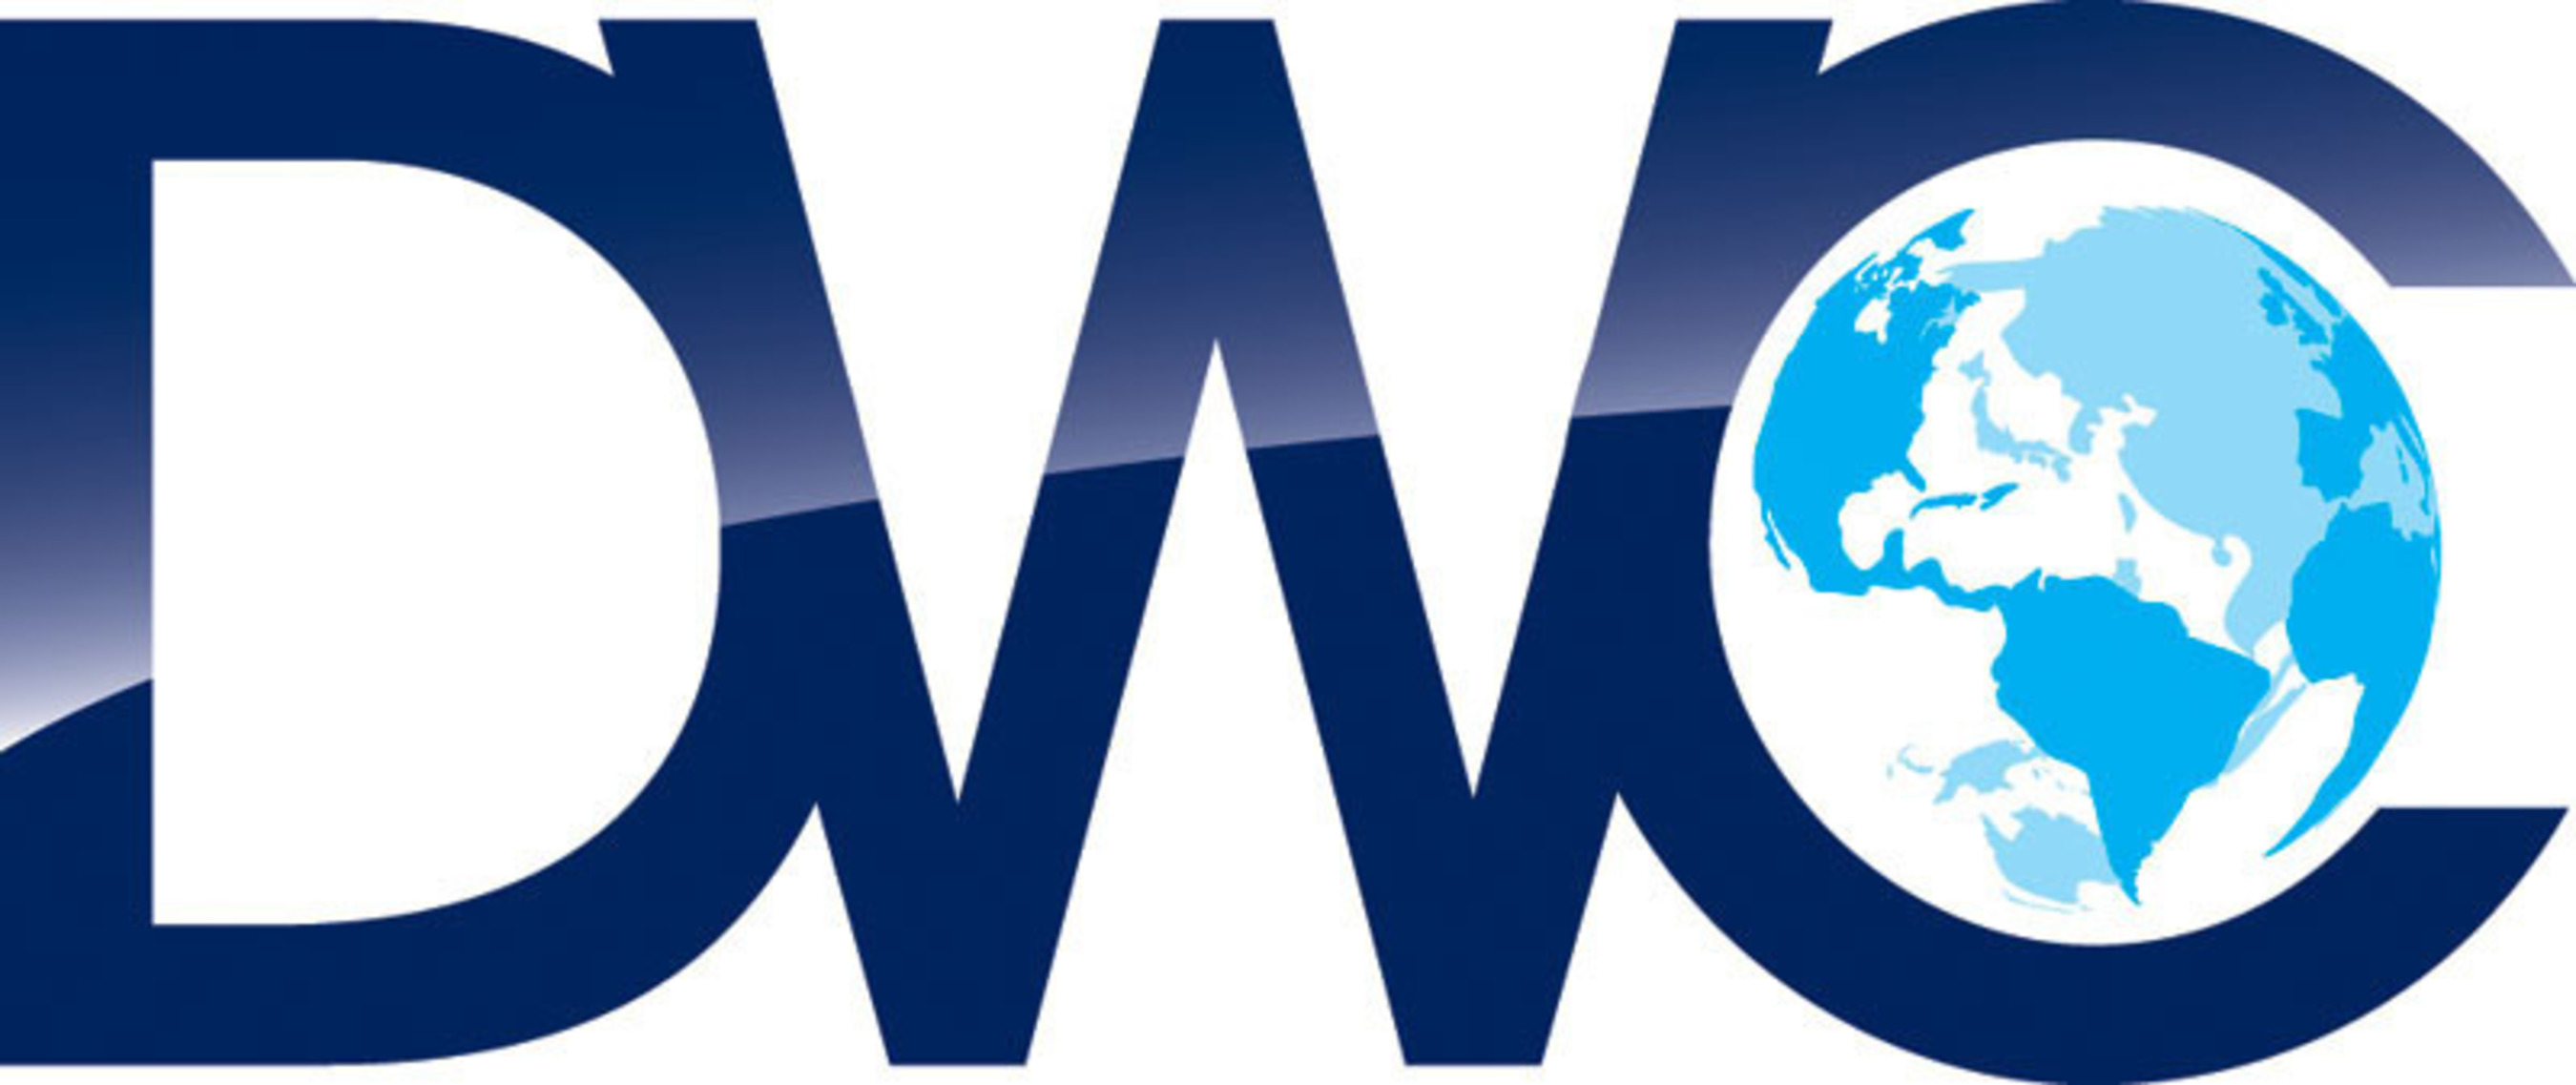 David Widerhorn Consulting logo (PRNewsFoto/Melamed & Associates, Inc.)